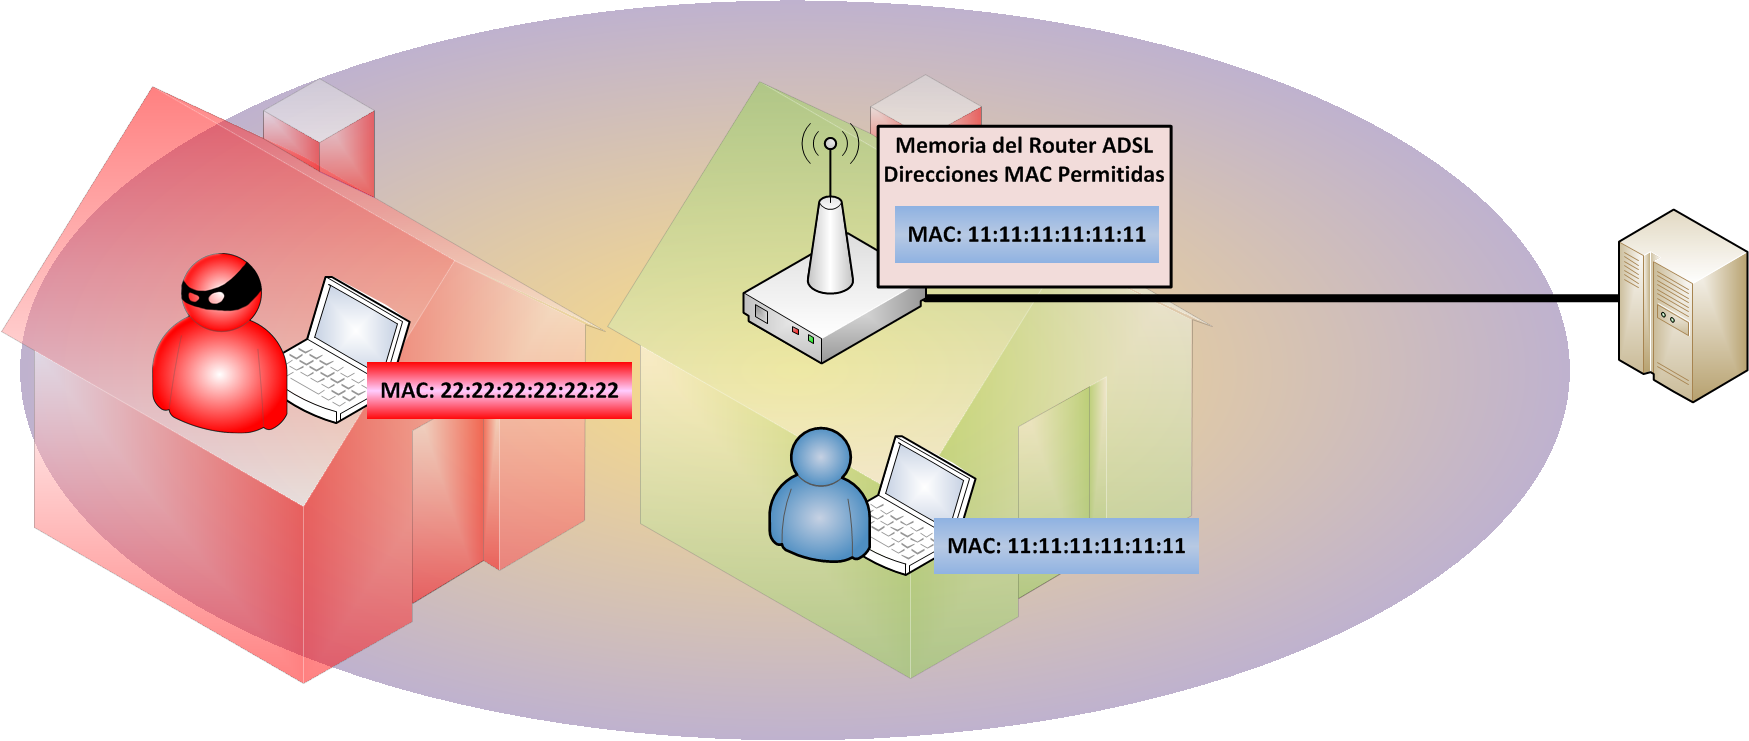 Vecino-roba-Wi-Fi-se-queire-conectar-con-una-direccion-MAC-diferente-www.Jarroba.com_